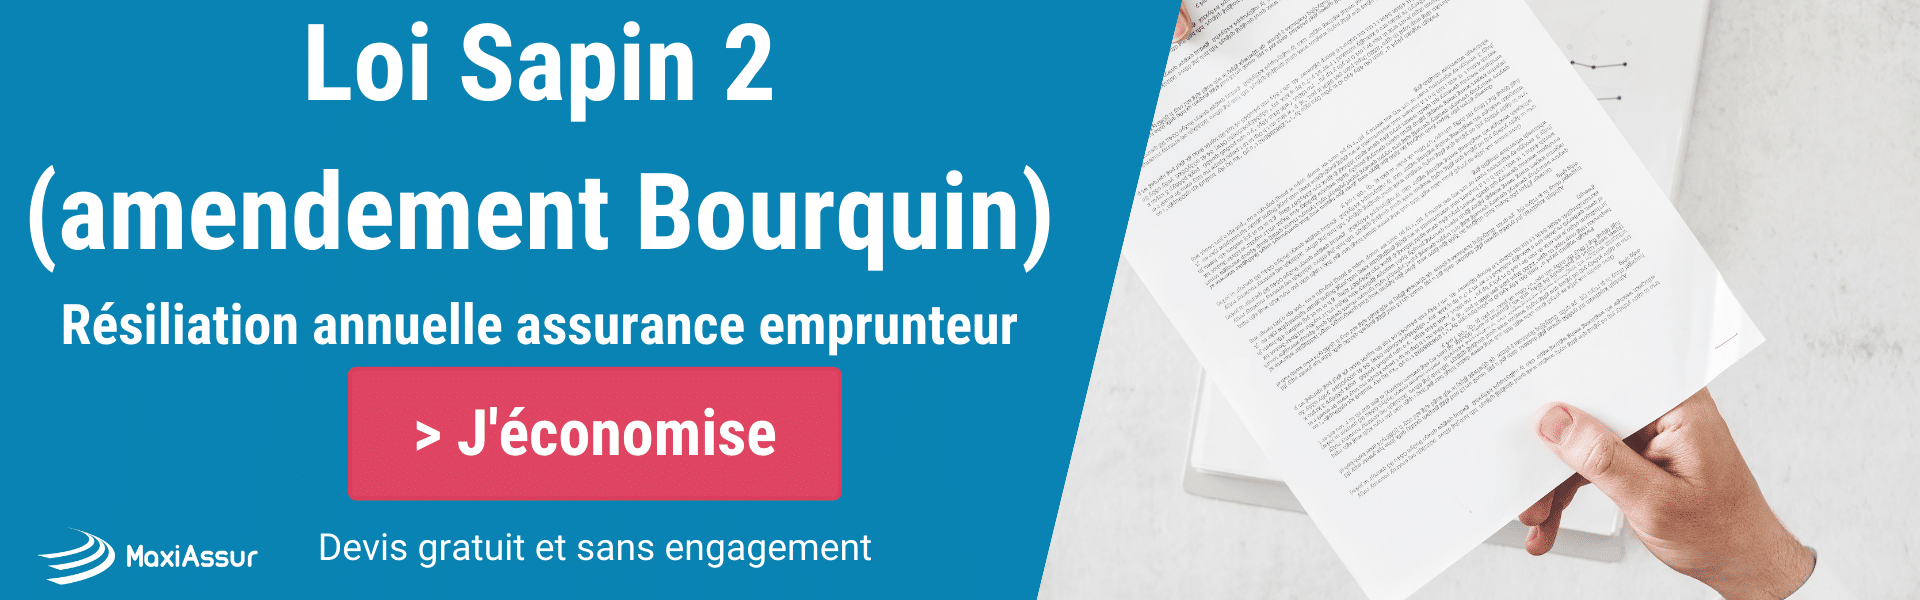 loi Sapin 2 (amendement Bourquin)